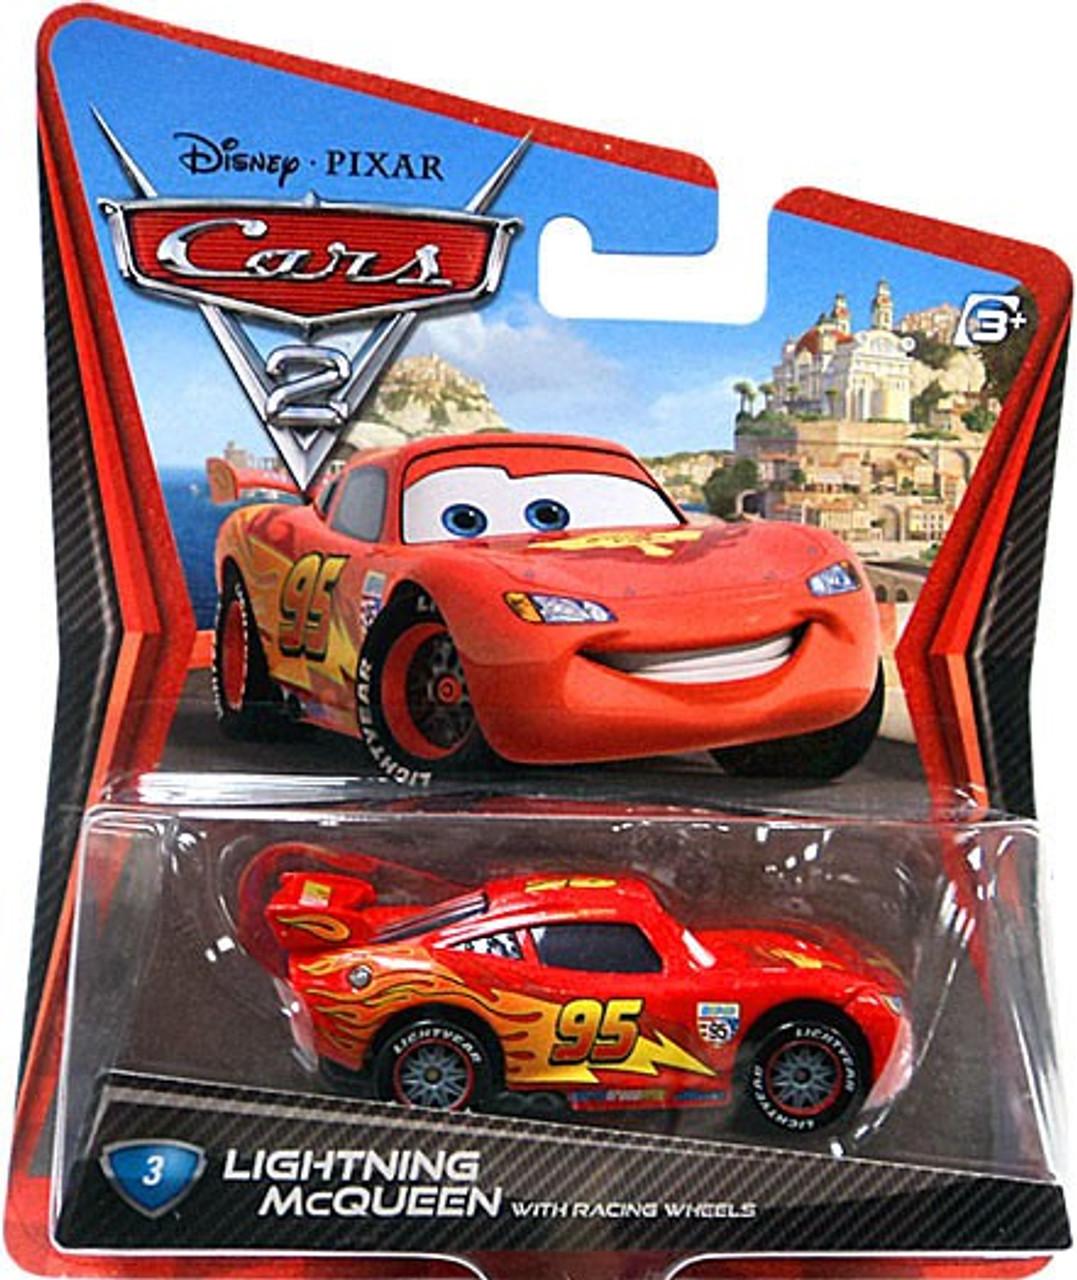 DISNEY PIXAR CARS 2 WORLD GRAND PRIX SERIES LIGHTNING MCQUEEN W// RACING WHEELS